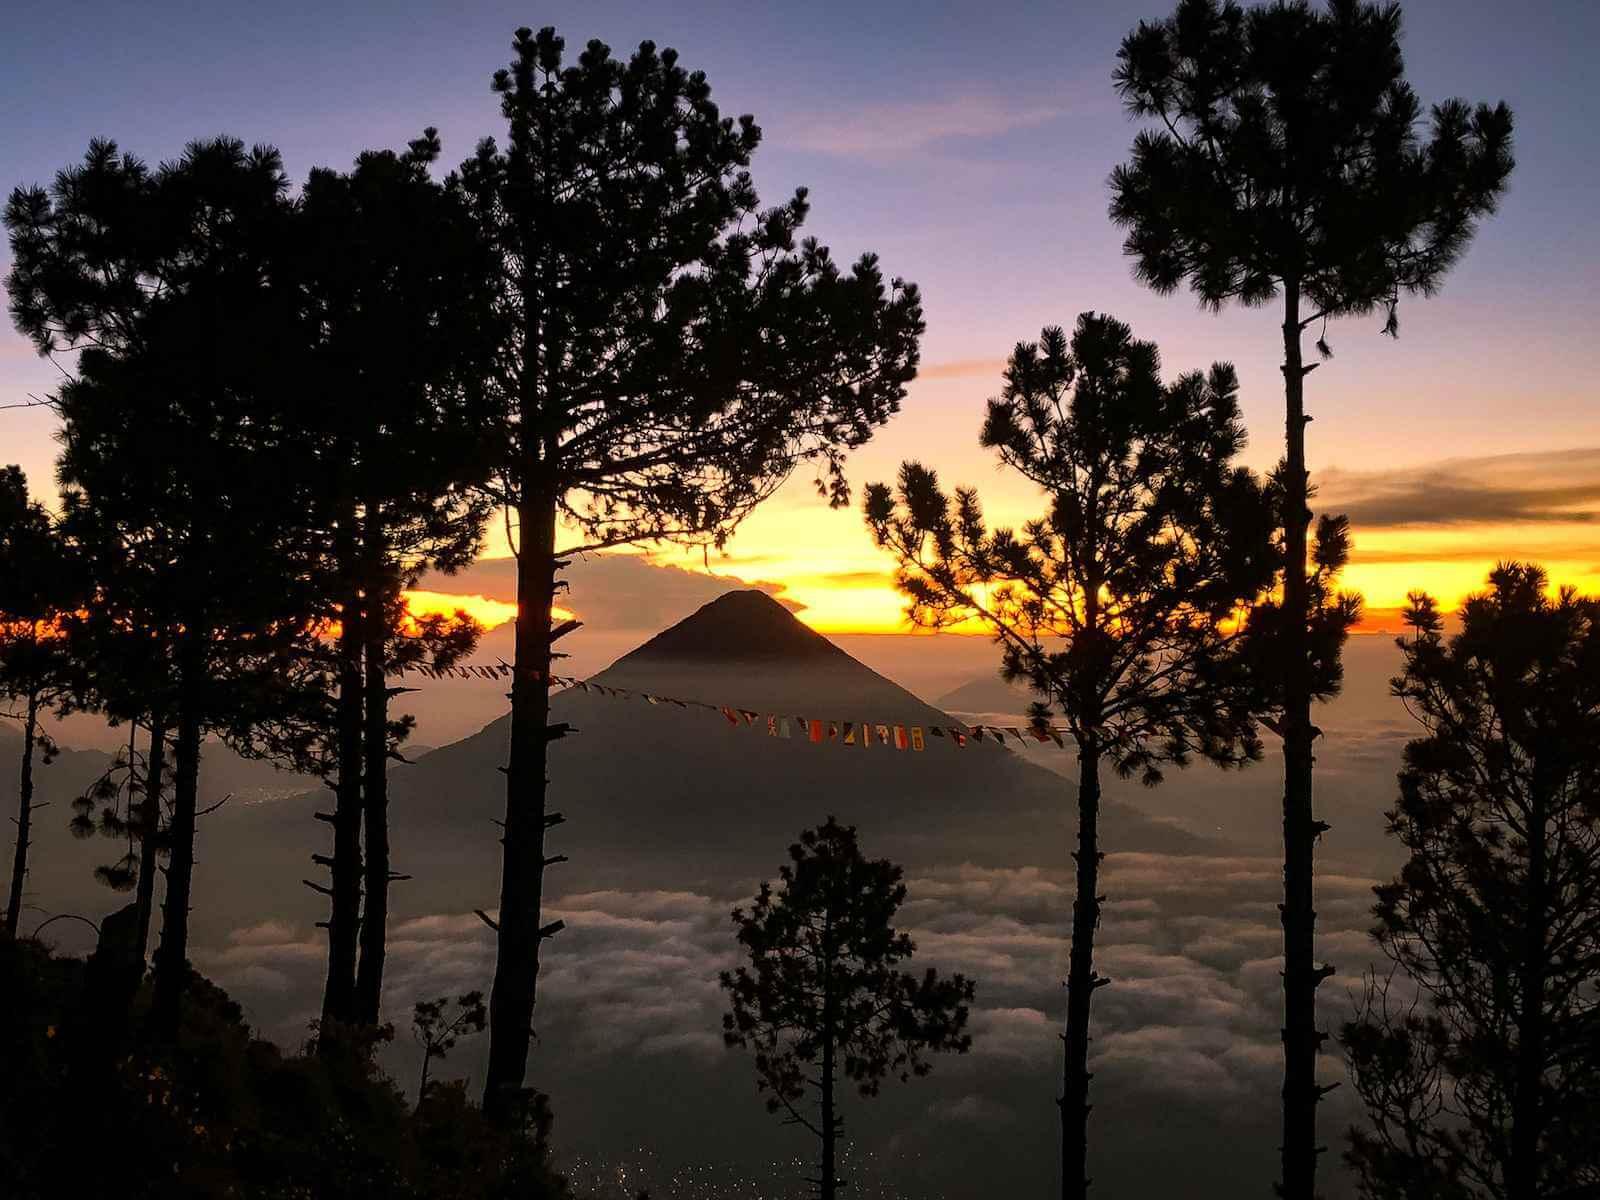 Acatenango Vulkaan beklimmen - zonsopgang